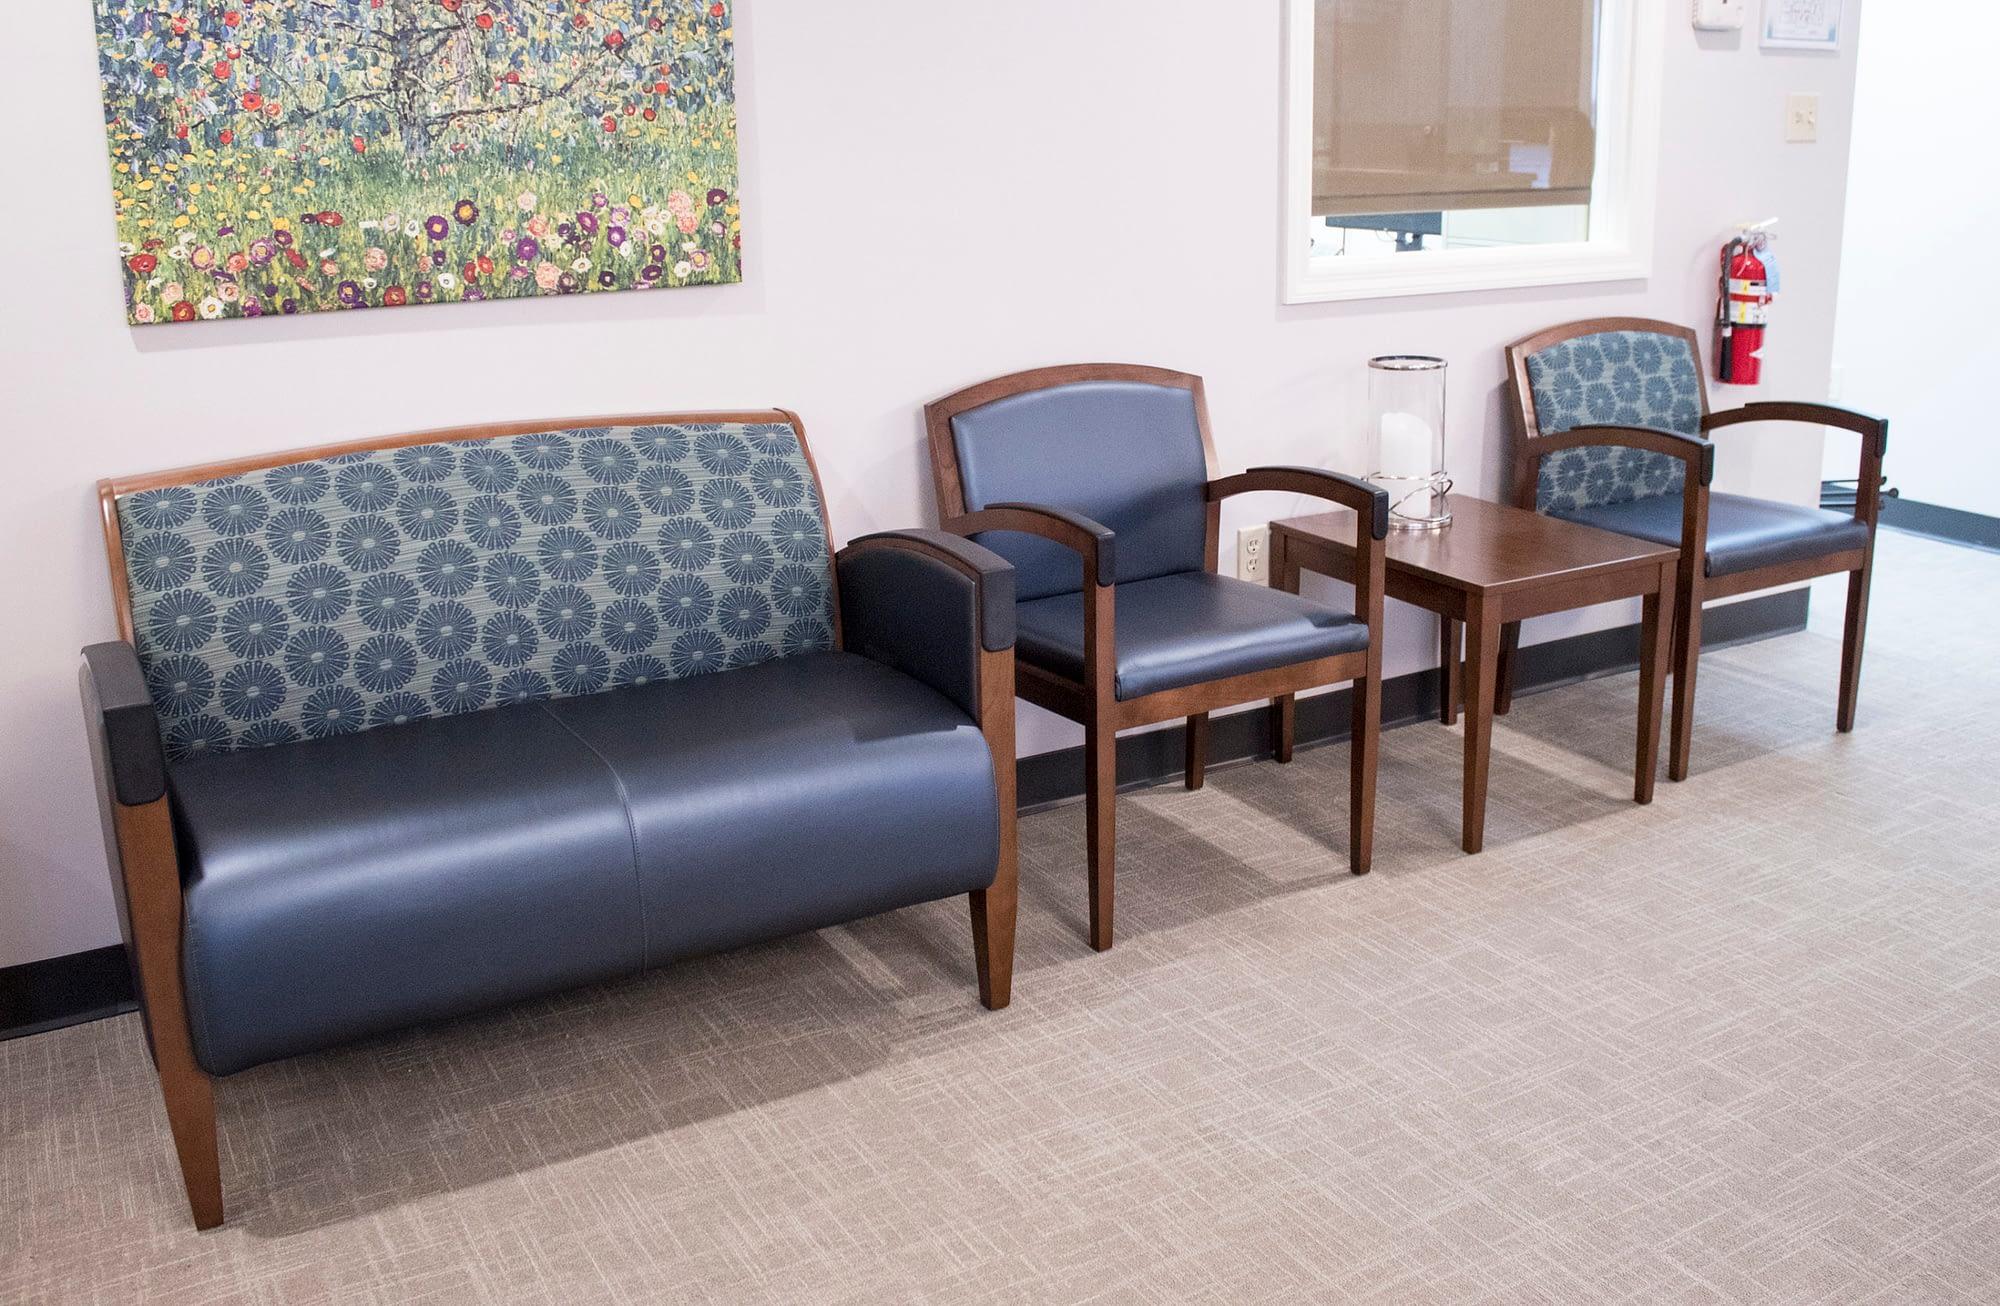 Three Seats in Waiting Room